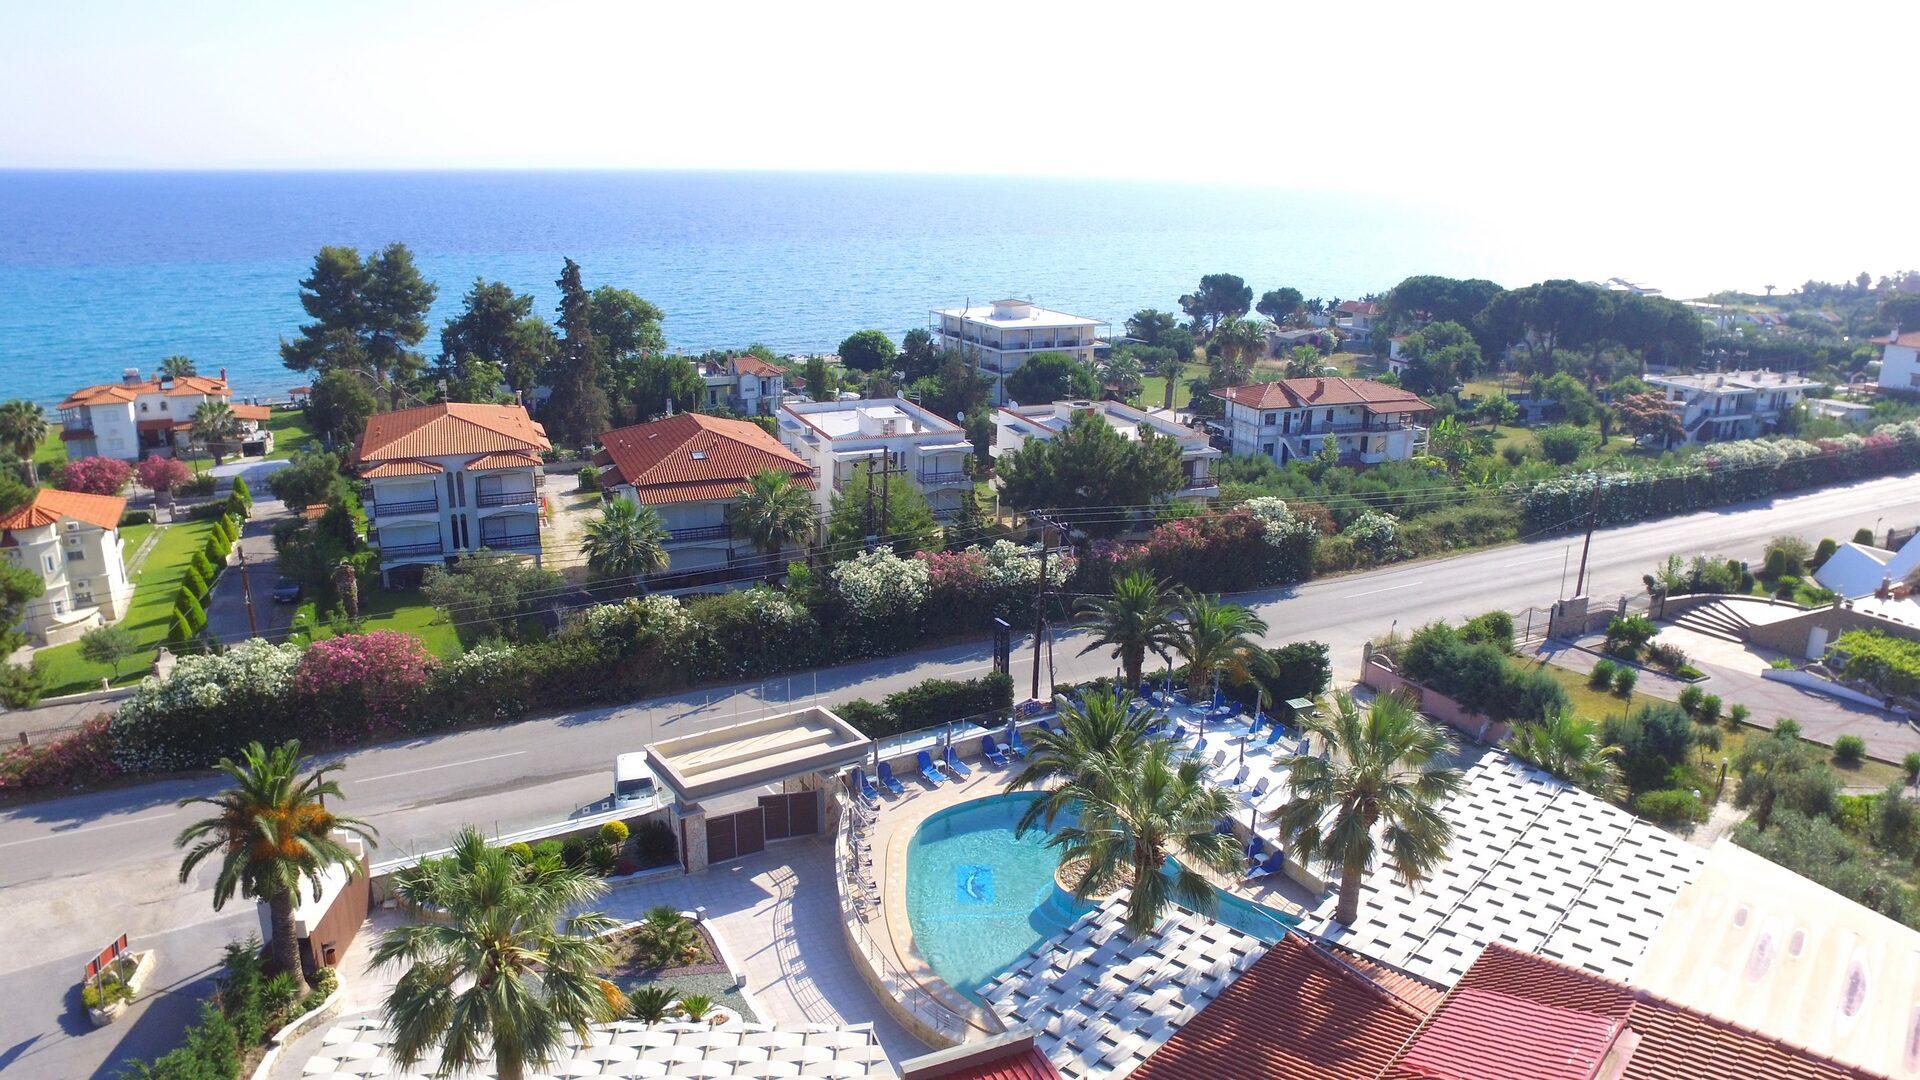 Anna Maria Paradise Hotel